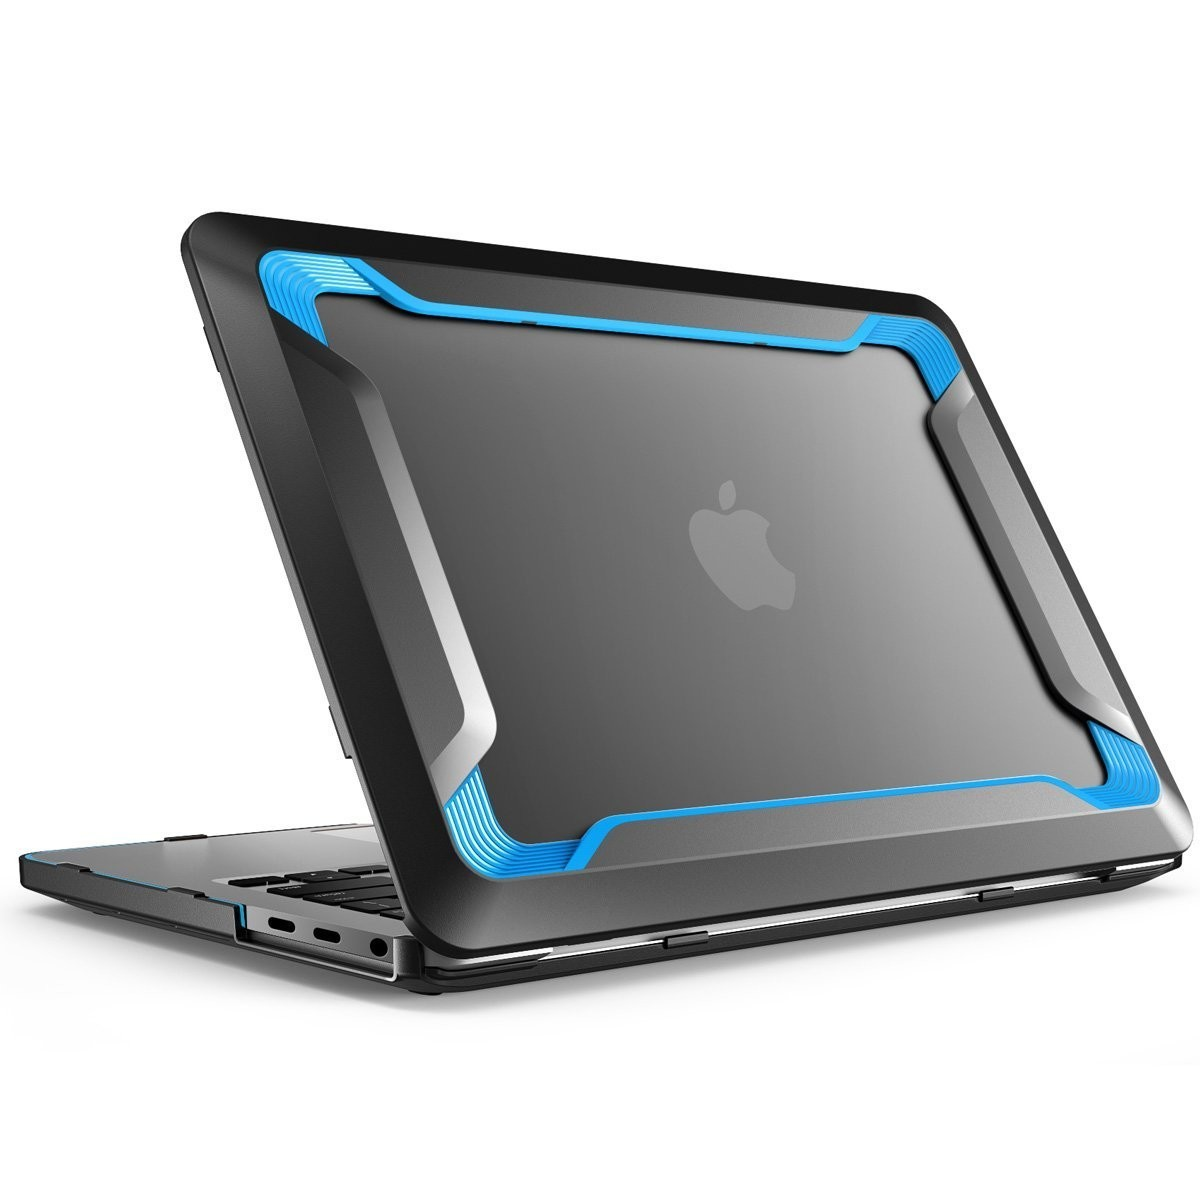 Macbook Pro Cases In 2018 Imore